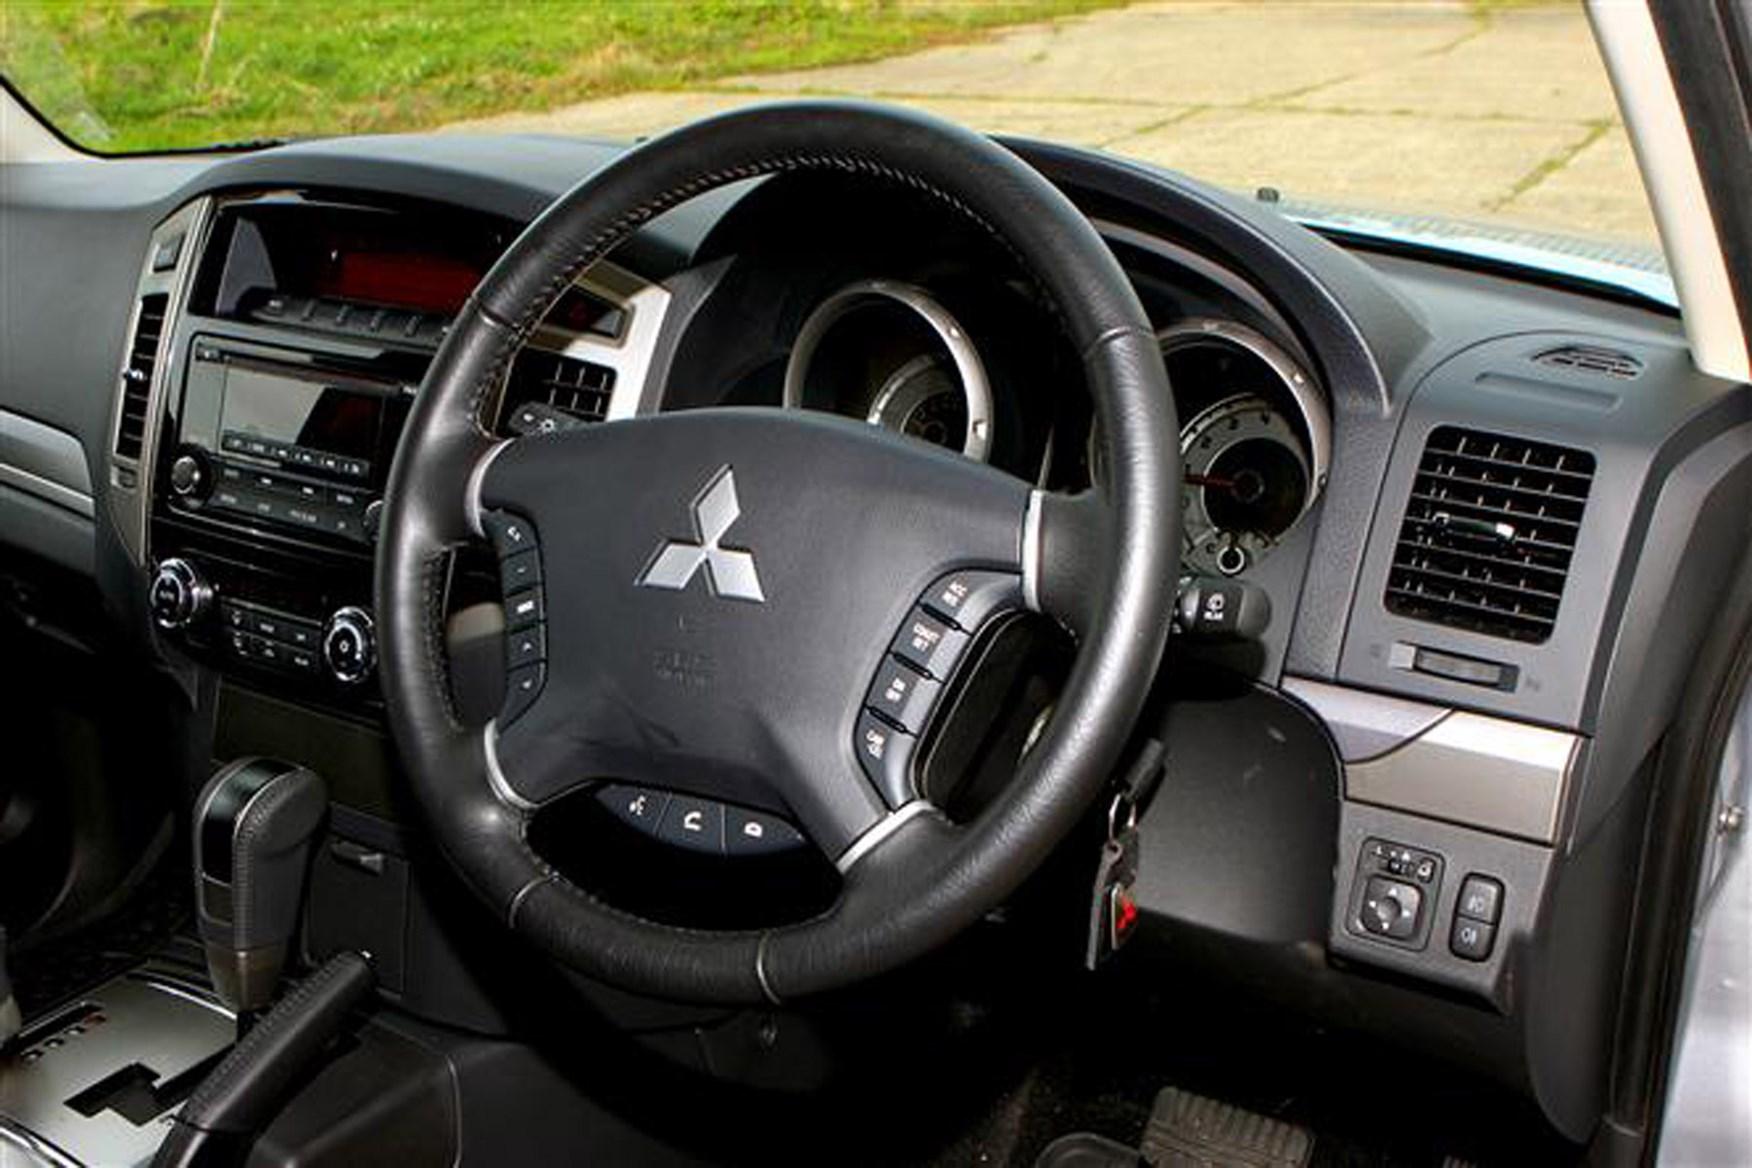 Mitsubishi Shogun review on Parkers Vans - cabin detail